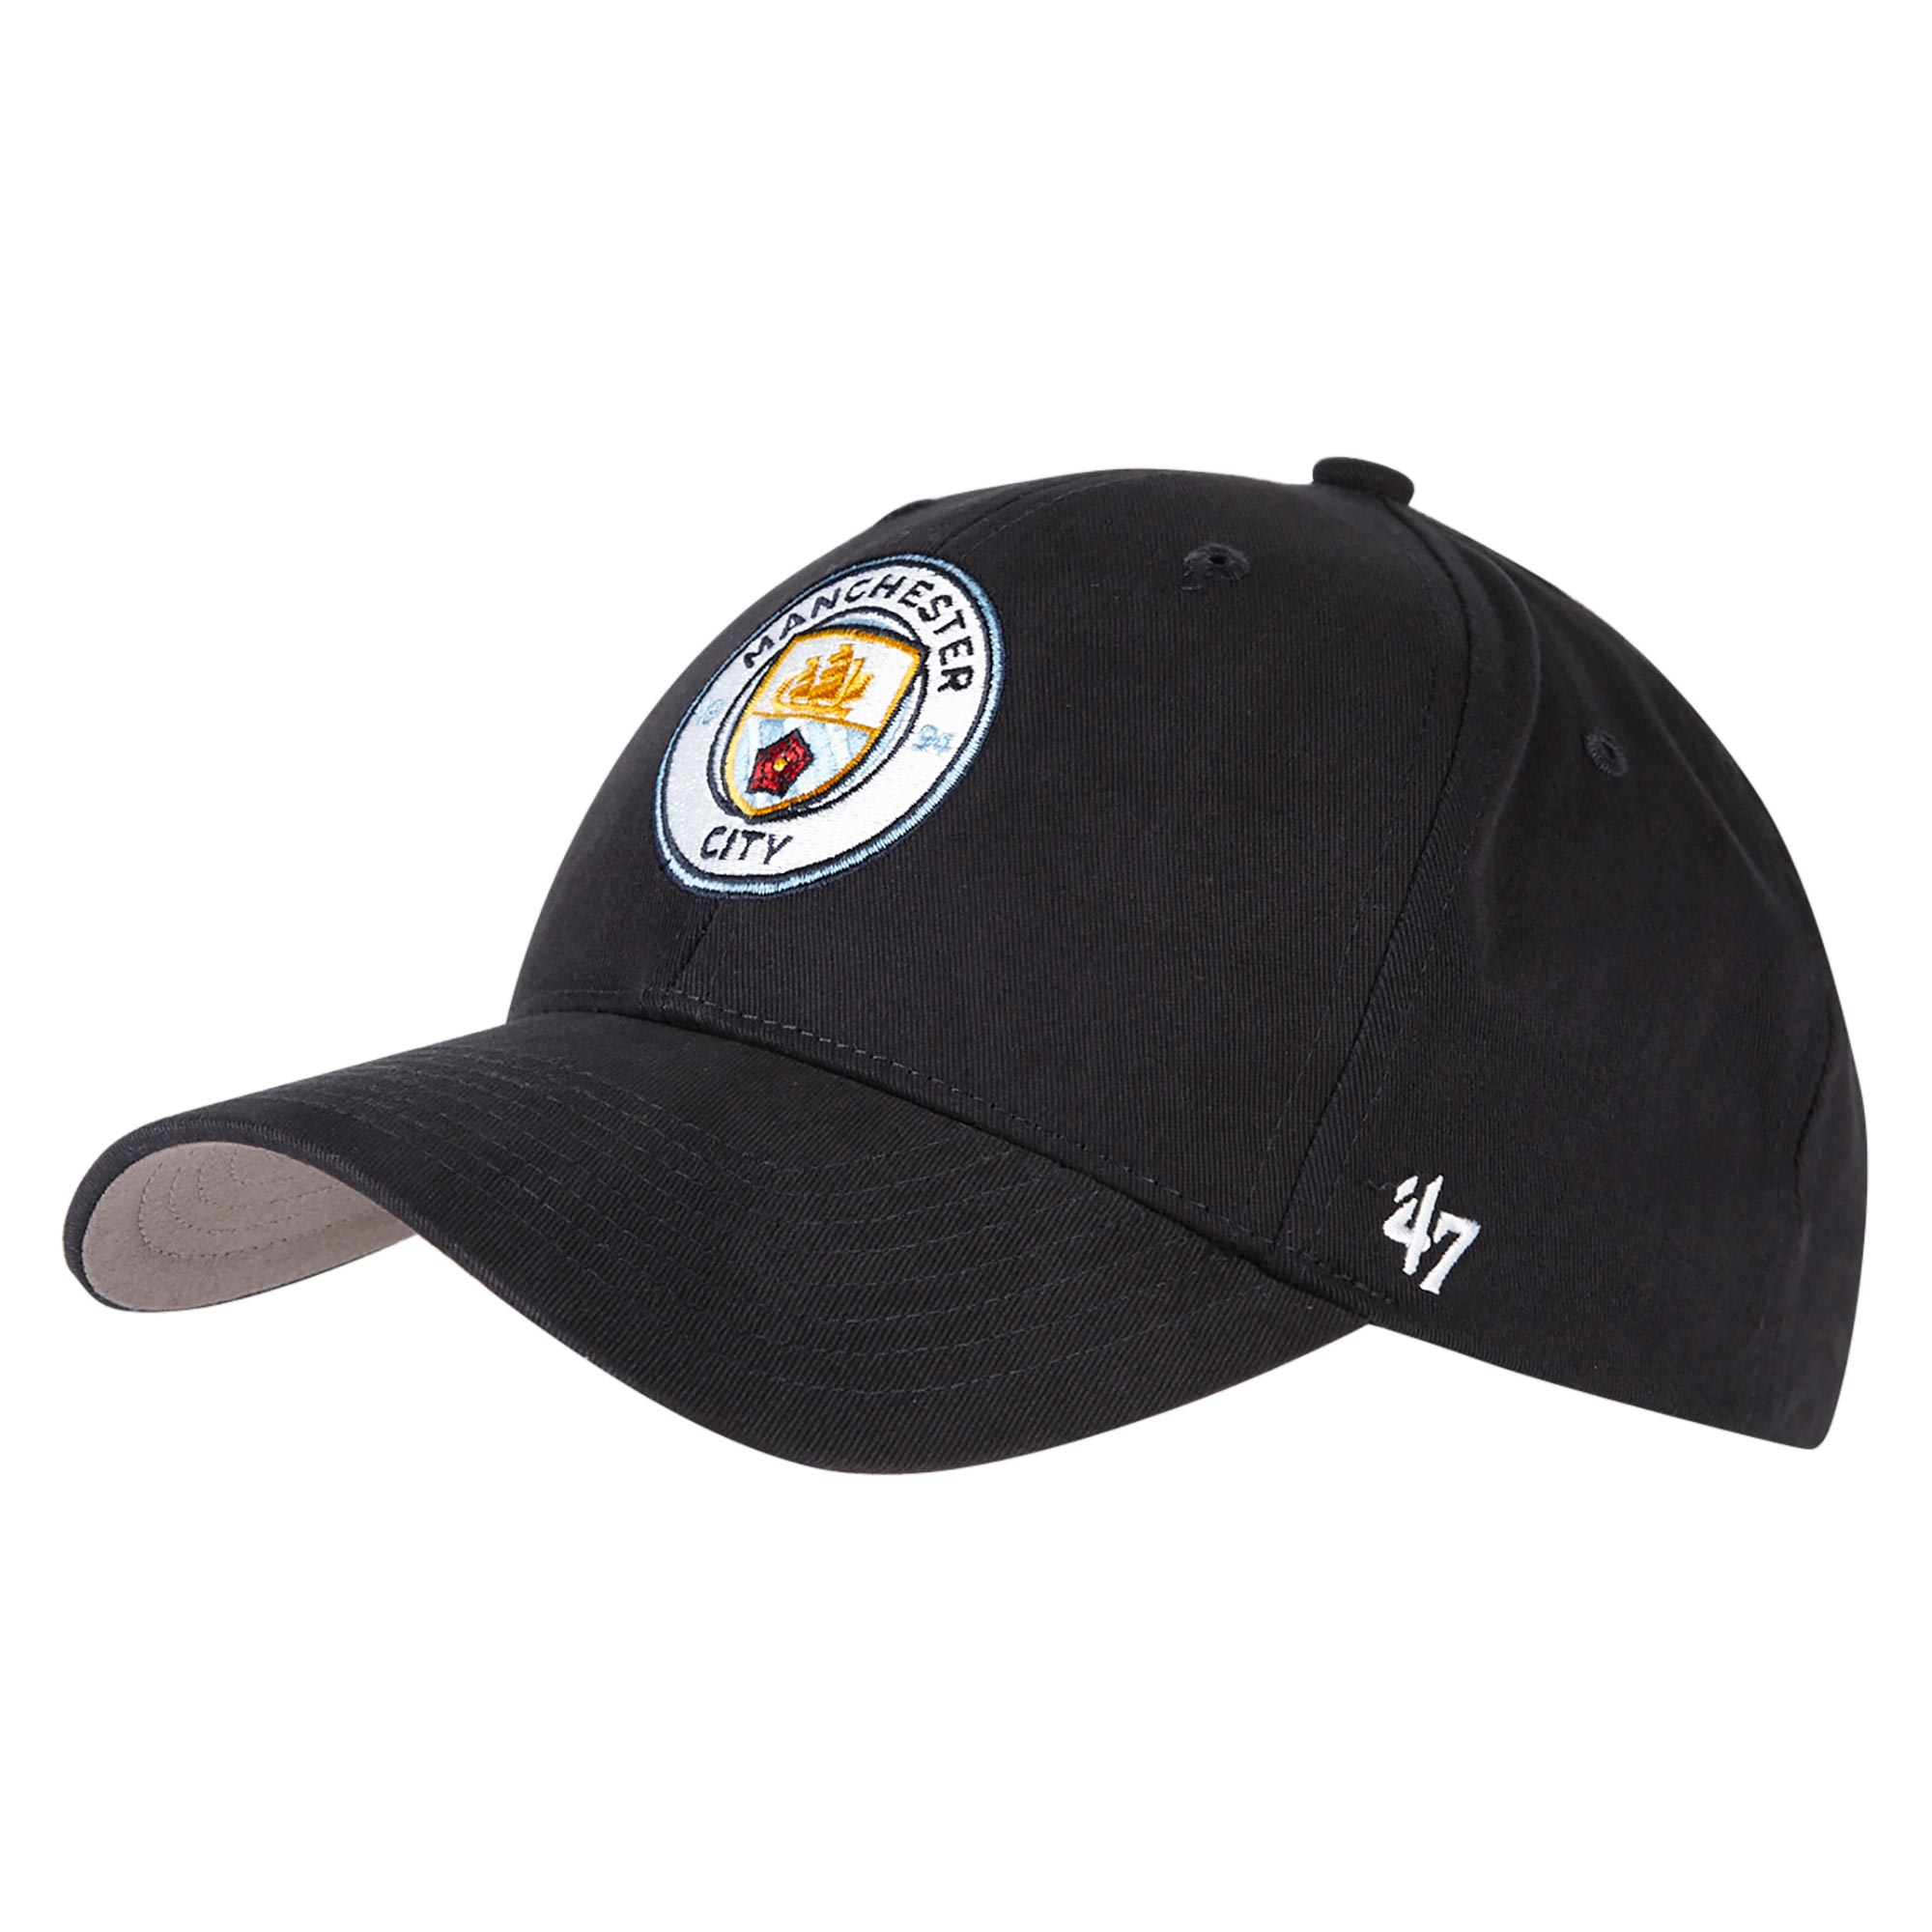 Manchester City 47 MVP Cap - Navy - Junior